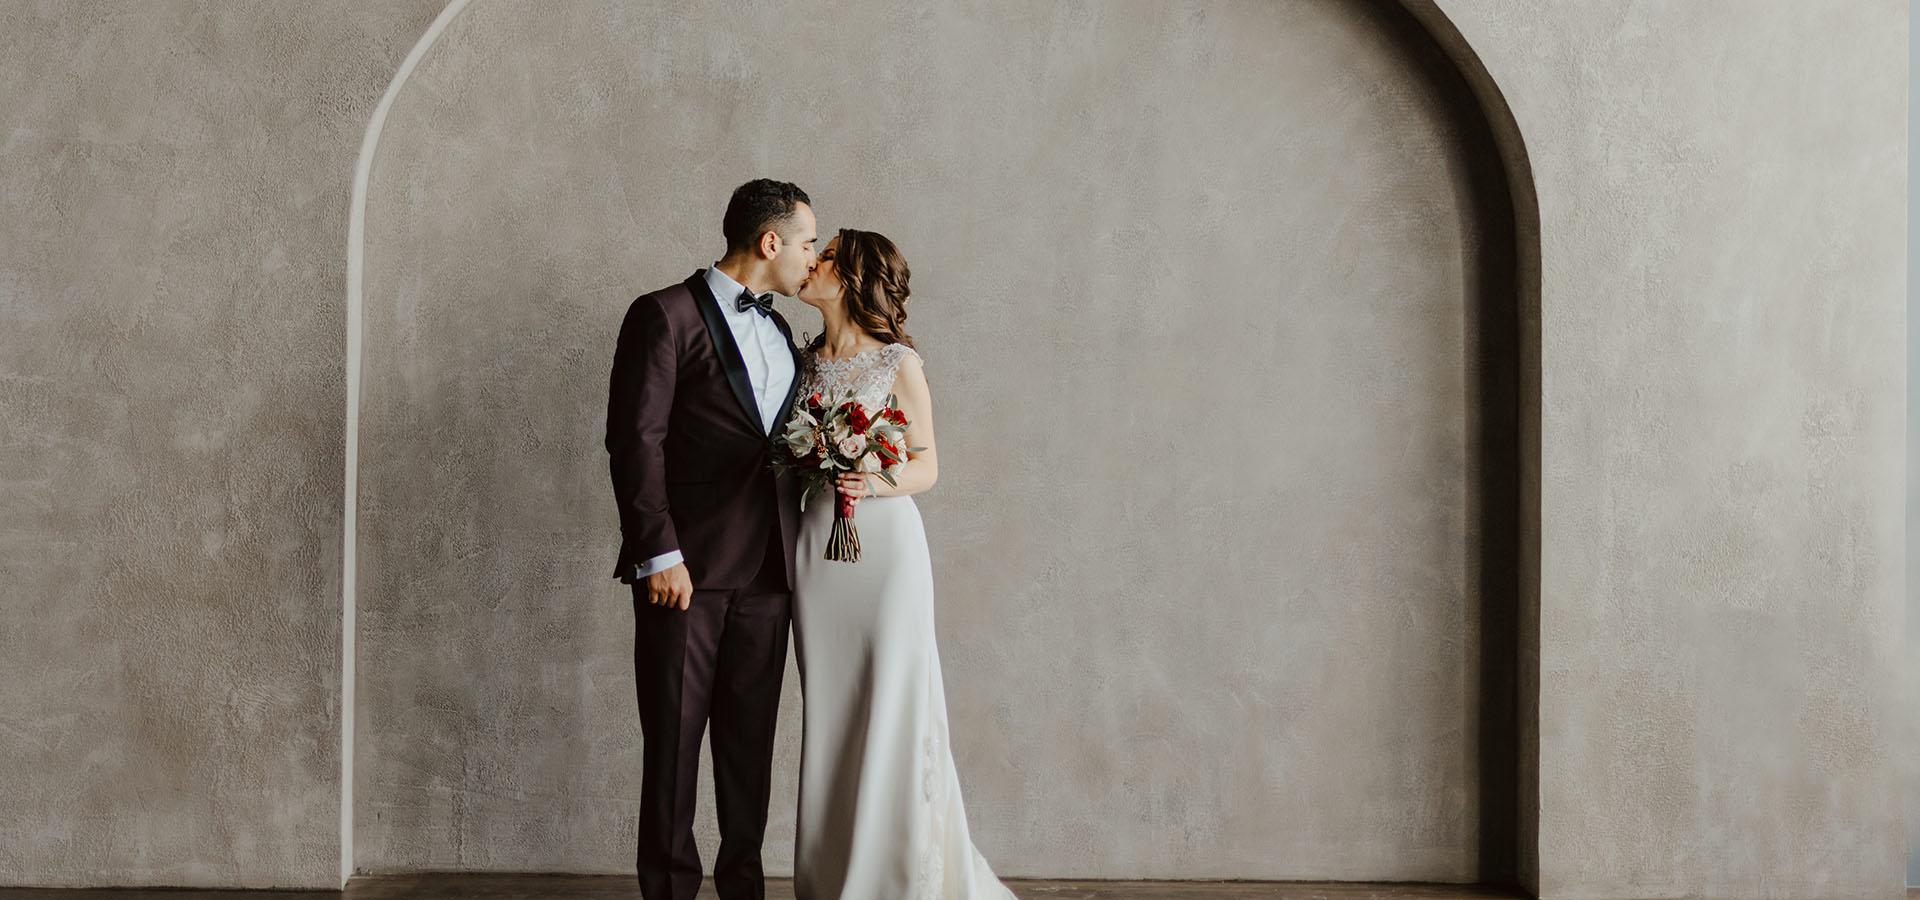 Hero image for Loredana and Sal's Gorgeous Wedding at Archeo